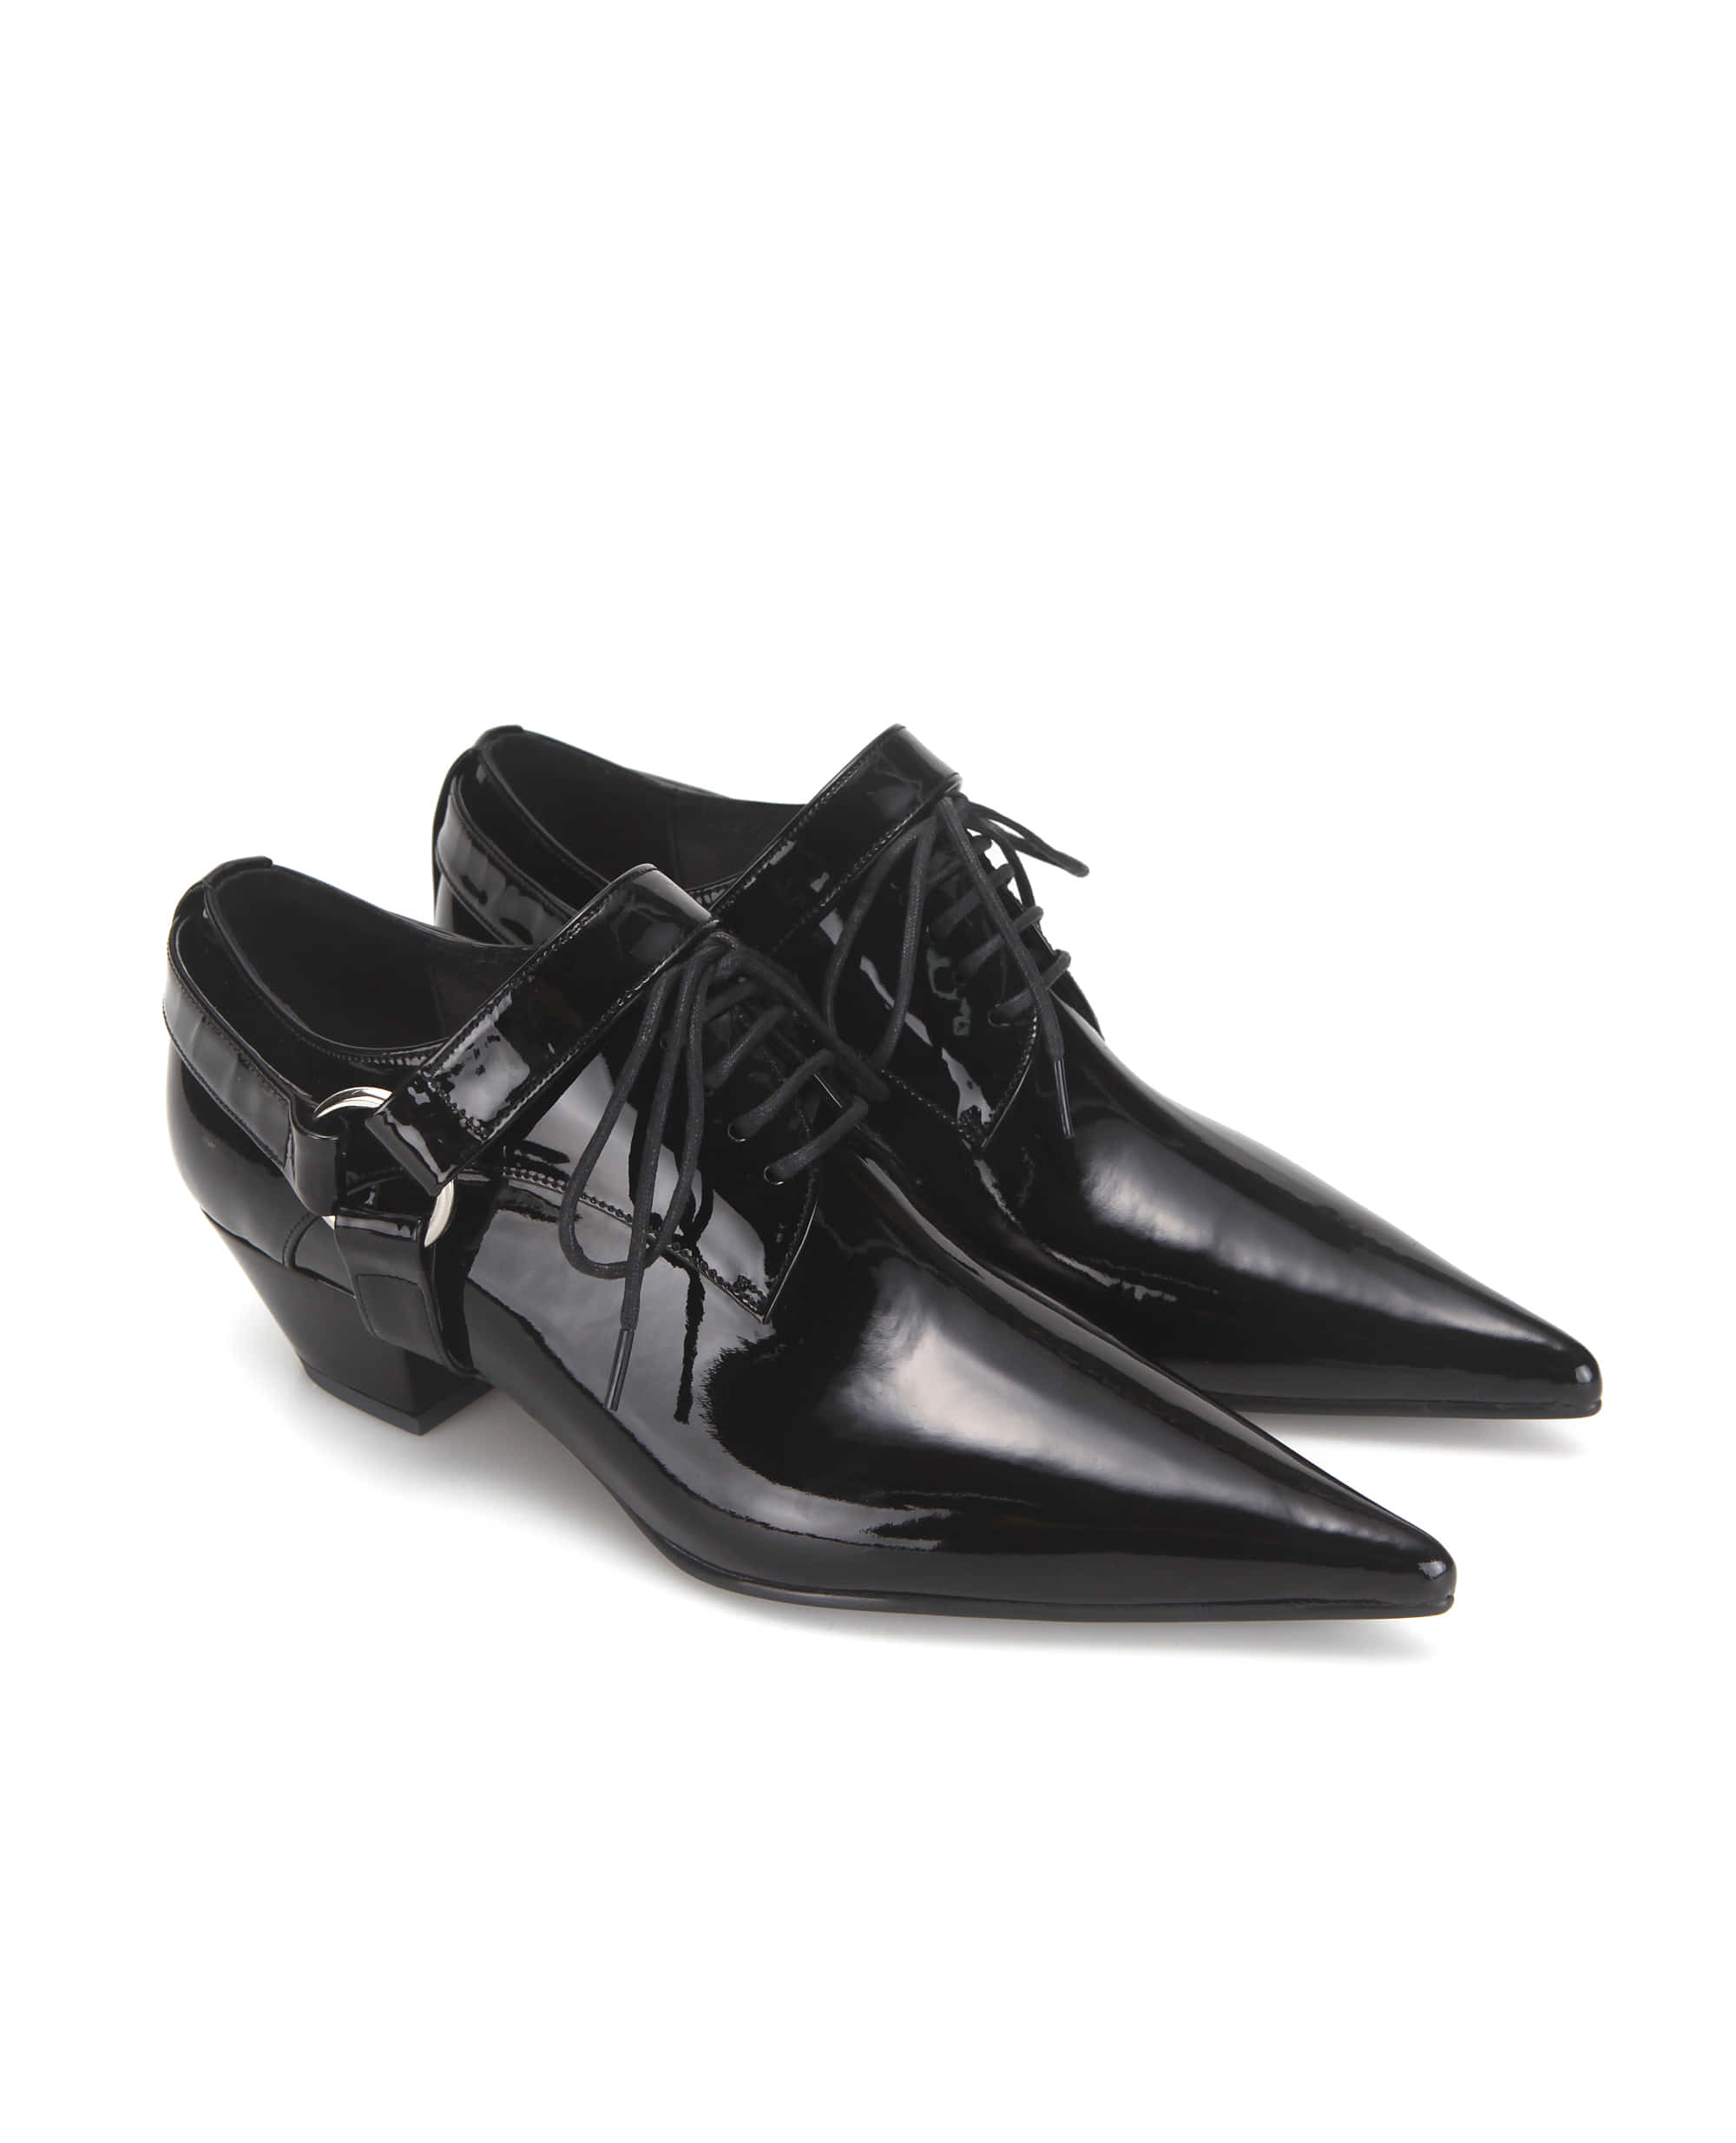 Extreme sharp toe derbys | Glossy black